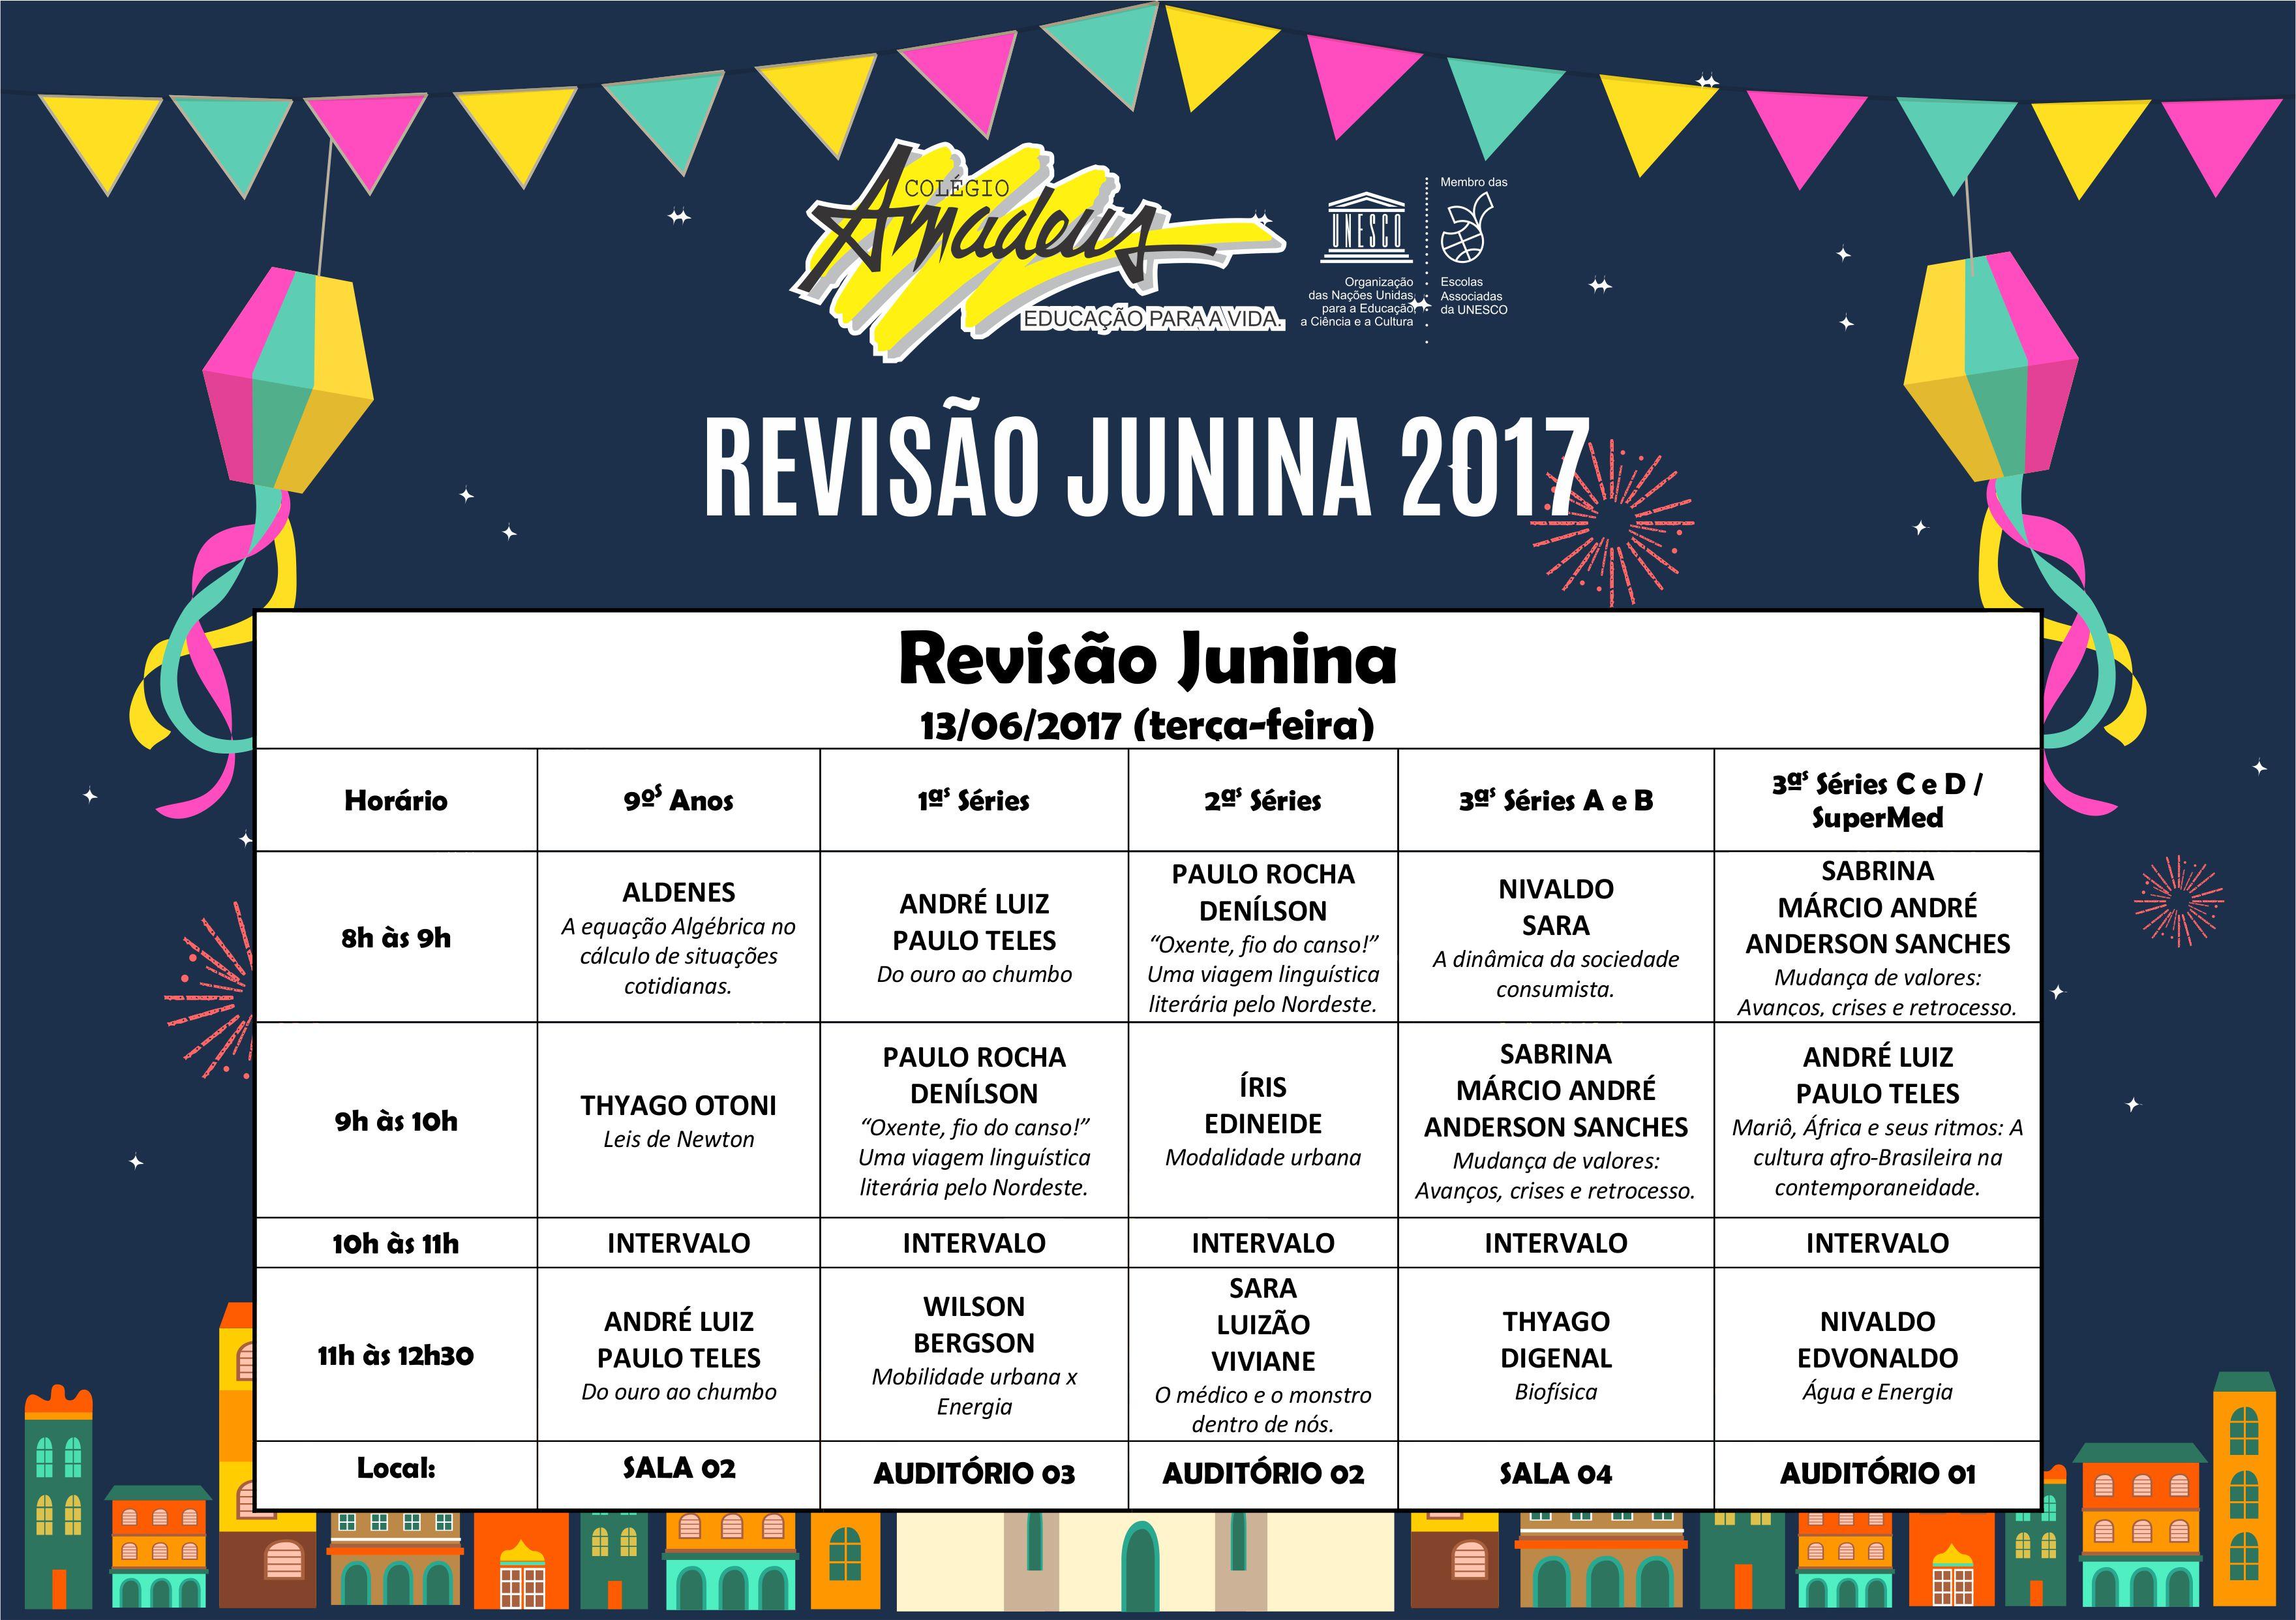 Revisão Junina 2017